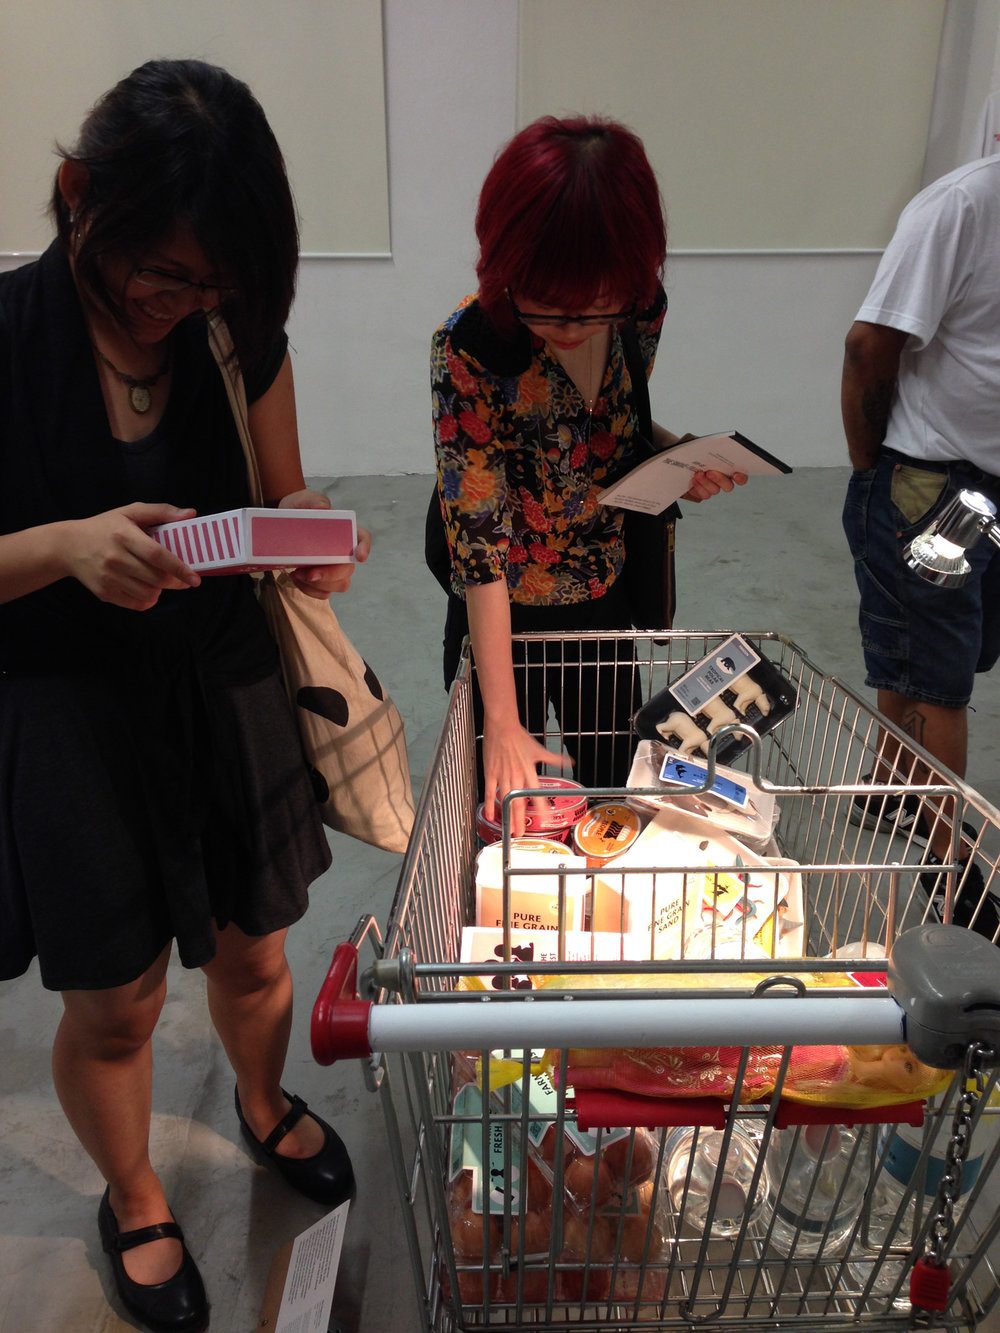 The Singapore Cart (2013)